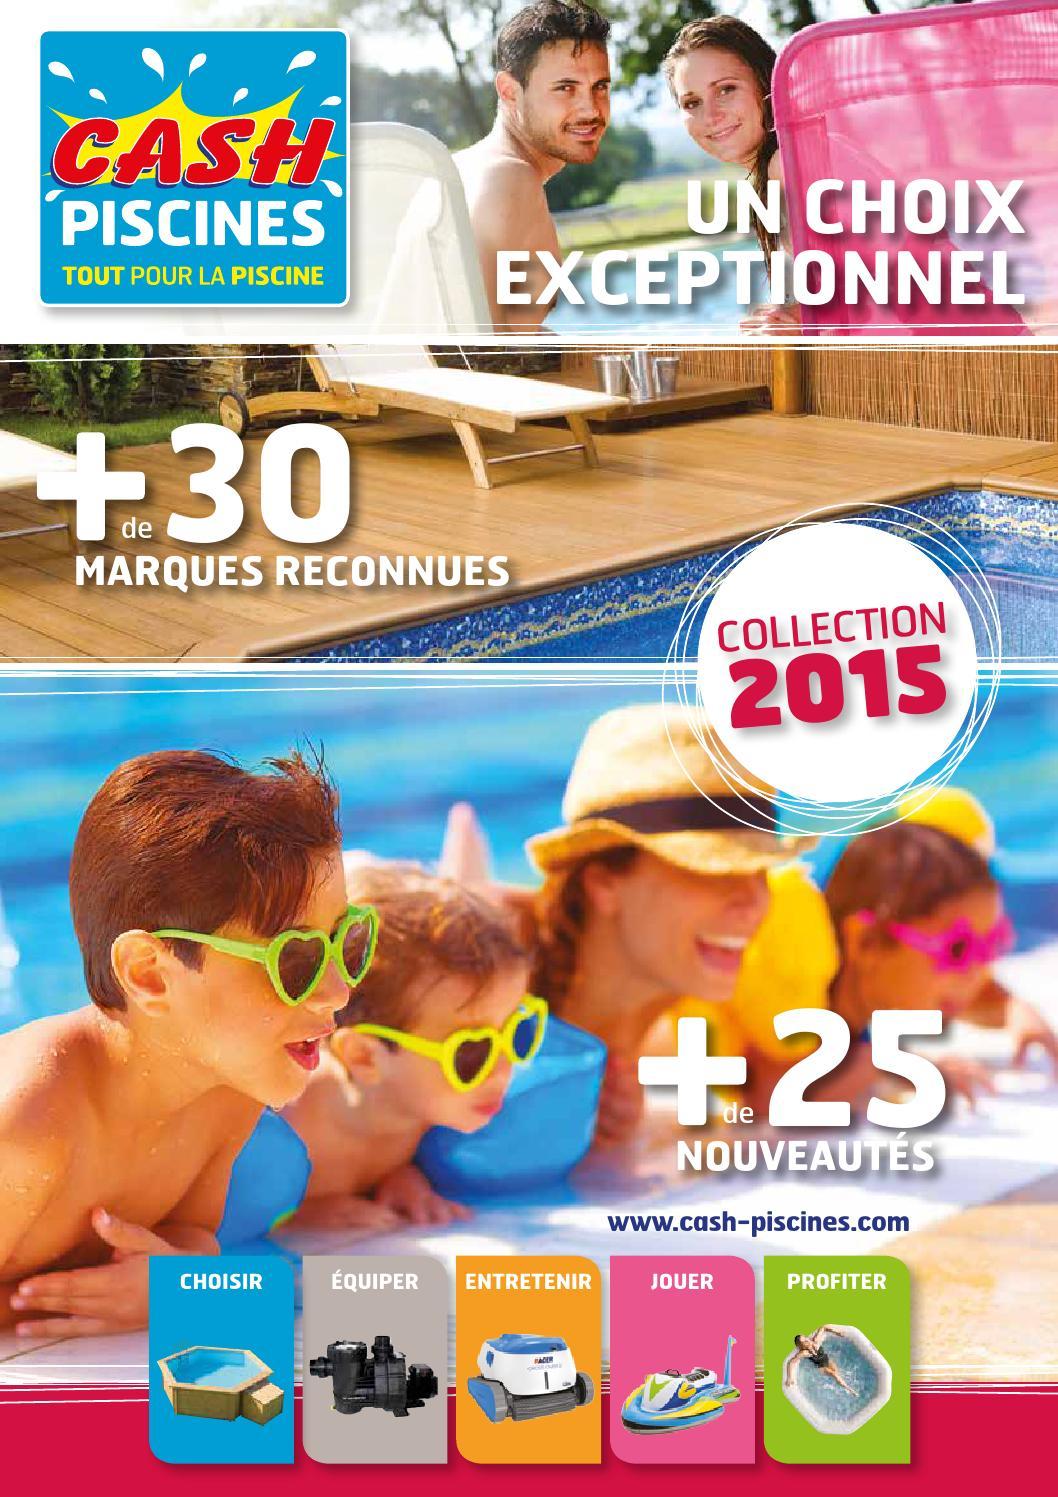 Catalogue Cash Piscines 2015 By Octave Octave - Issuu dedans Cash Piscine Montauban